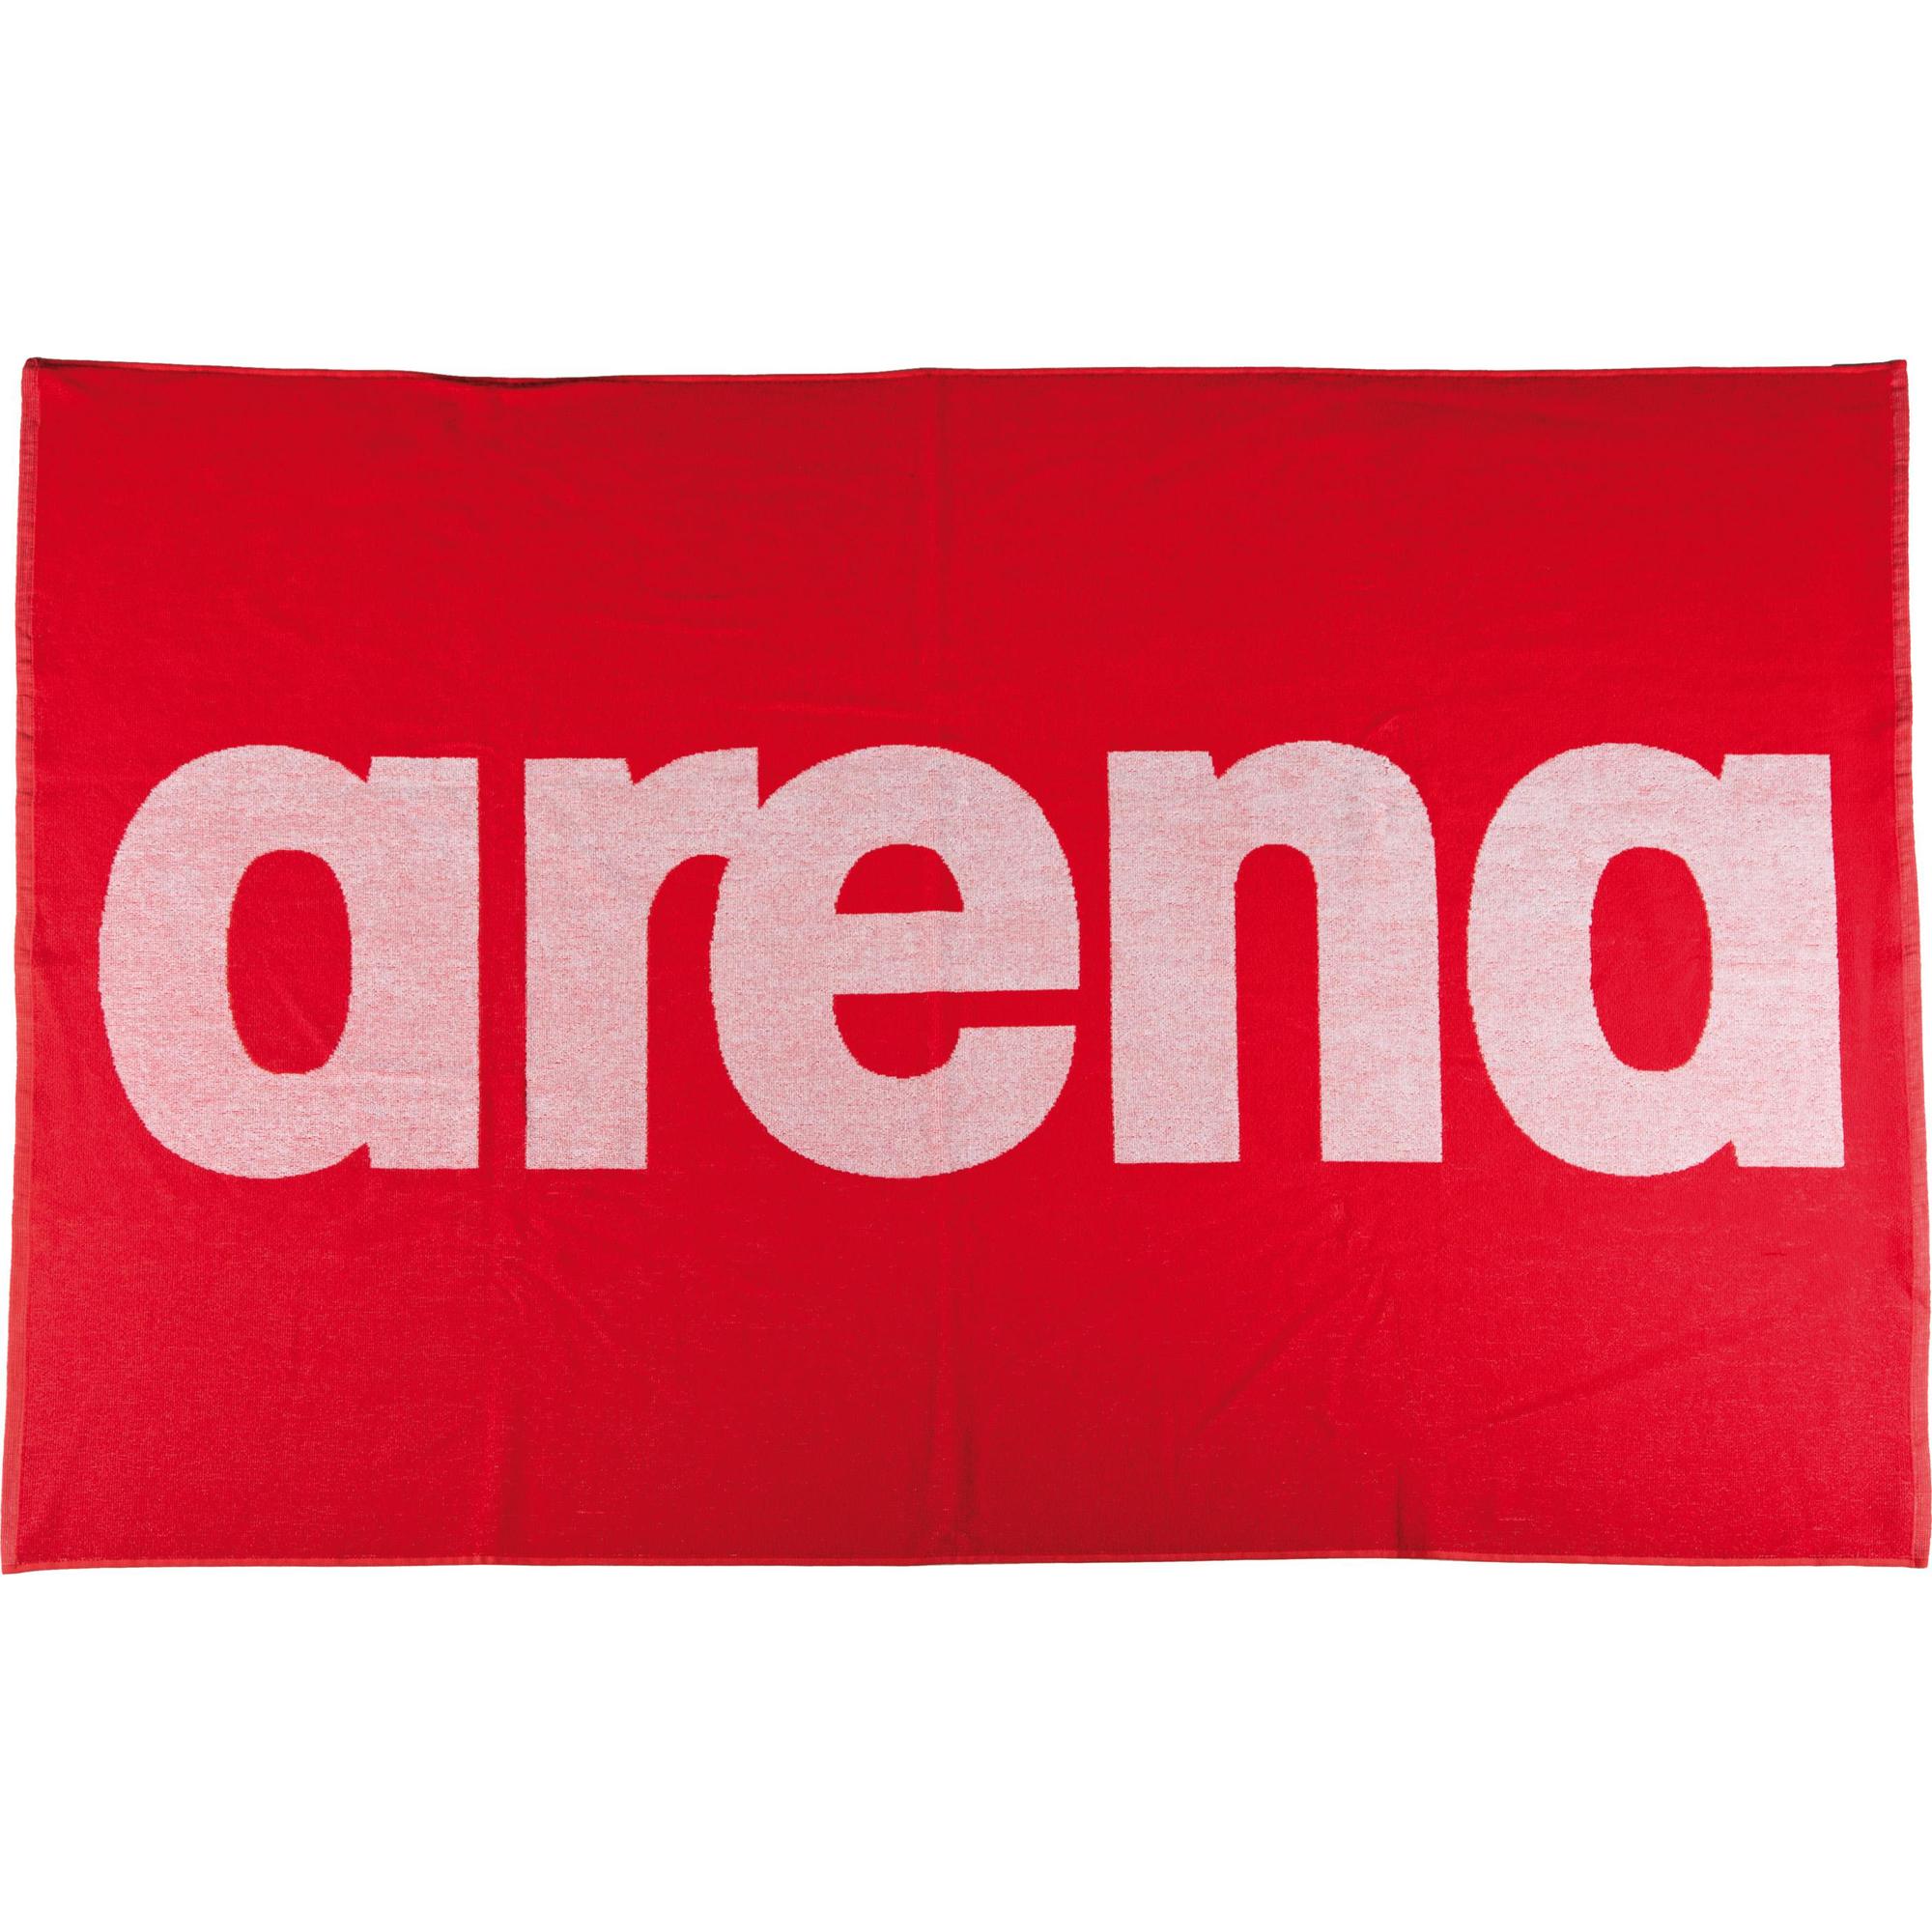 Arena Handtuch groß Handy 2A490-41